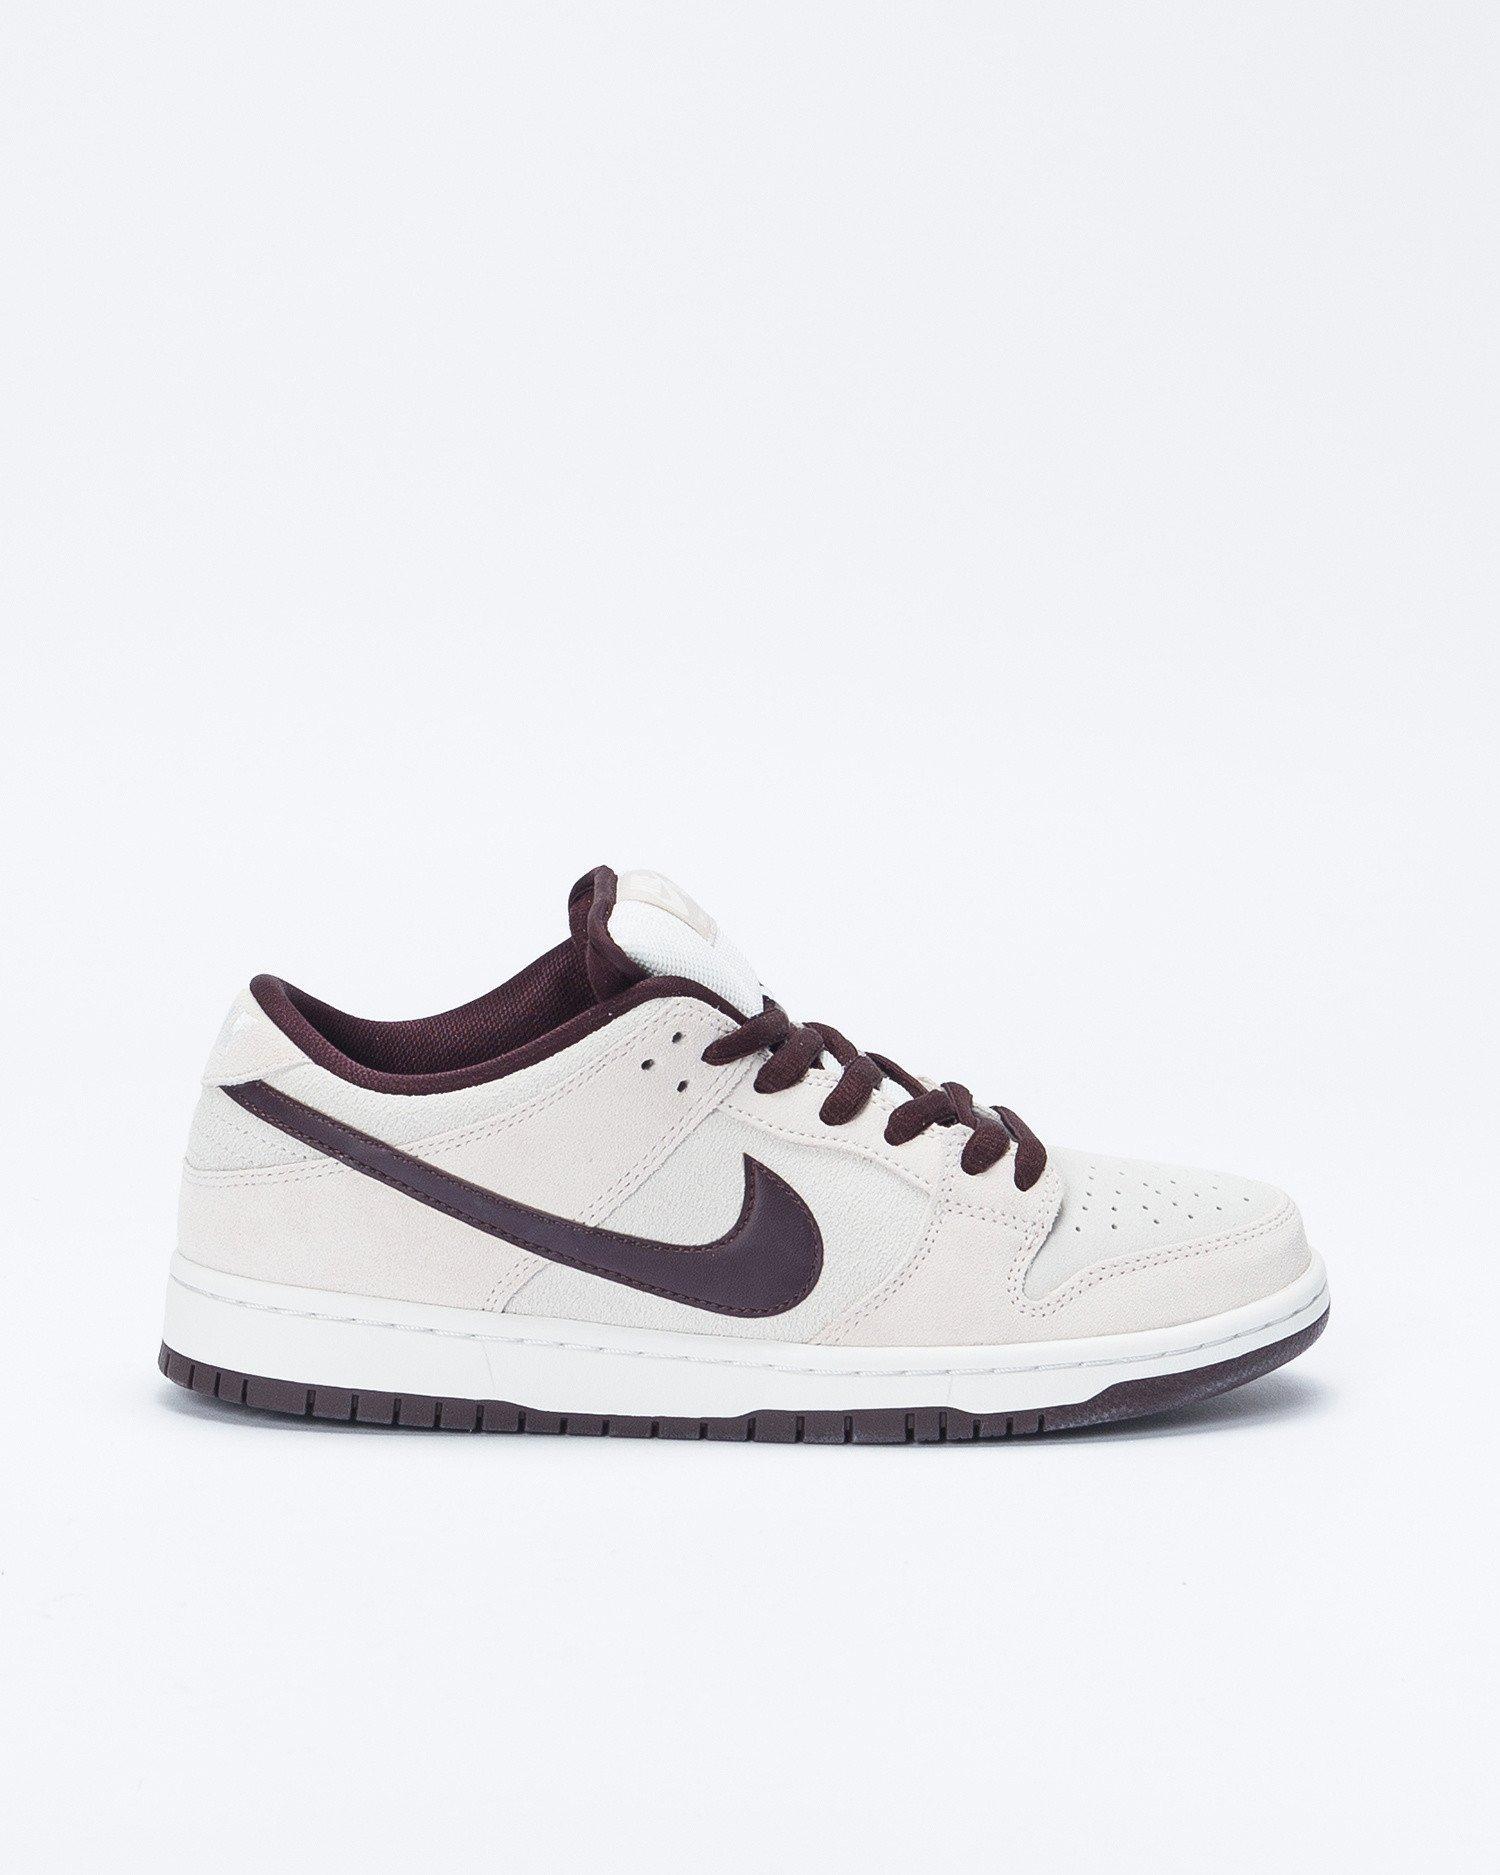 best service 2300d 6a871 Nike SB Nike SB Dunk Low Pro Desert Sand/Mahogany-Summit White